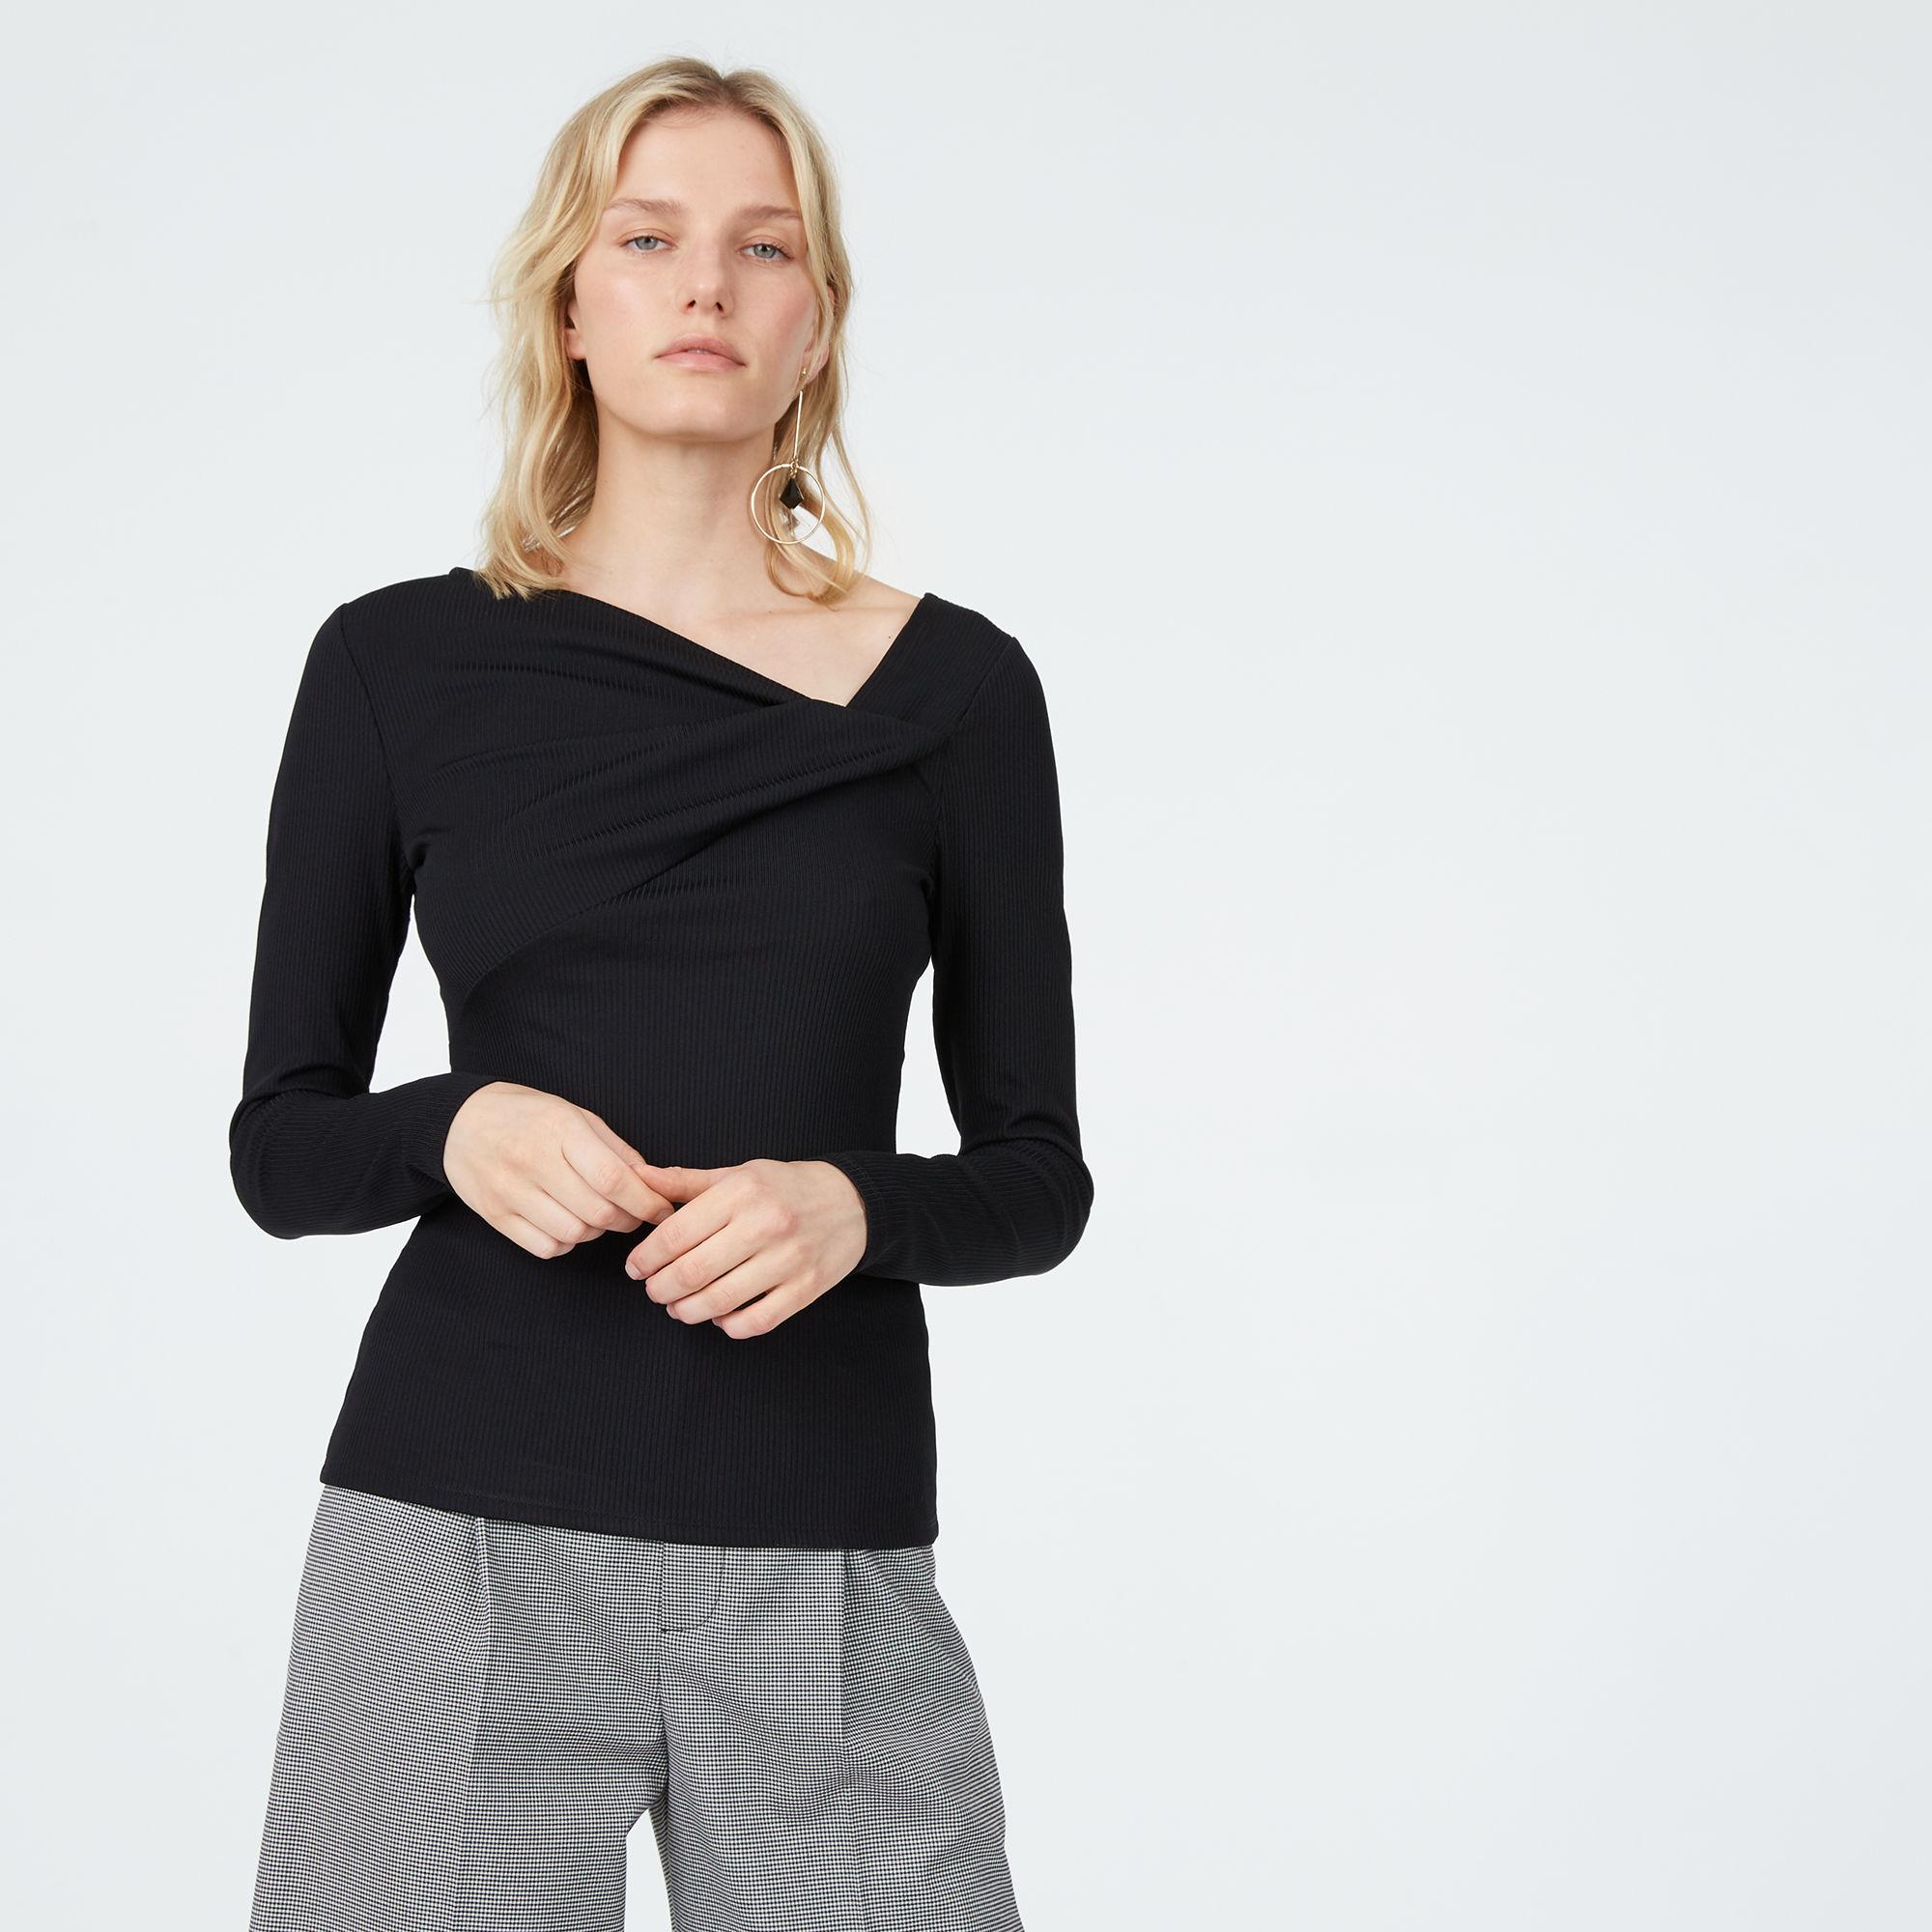 Asymmetrical top.